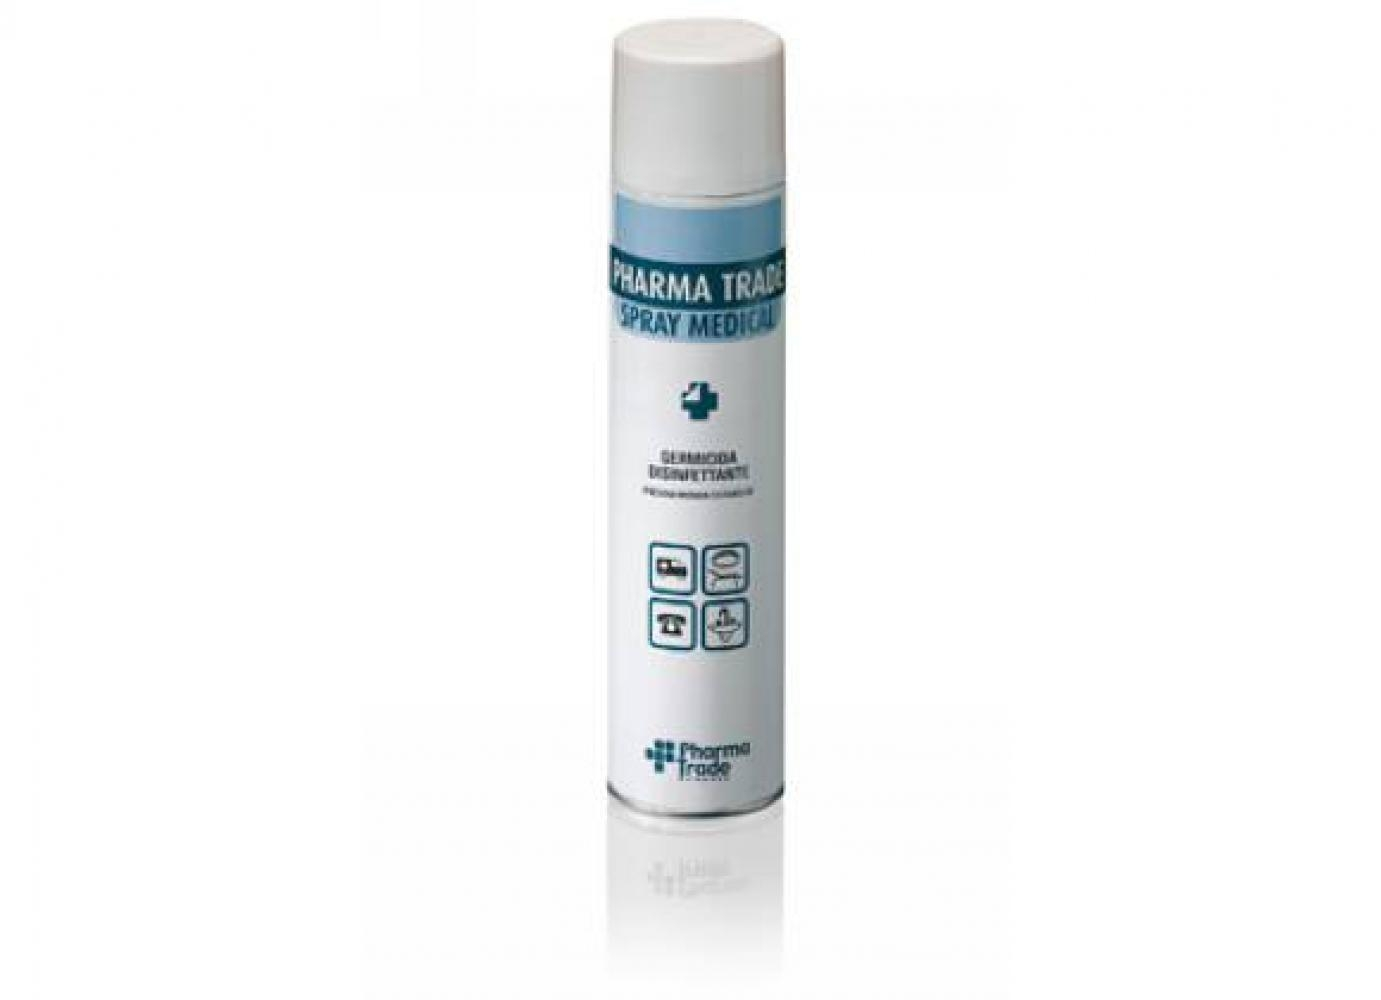 Acquista Spray Medical Bombola Ml 525 17545715   Glooke.com